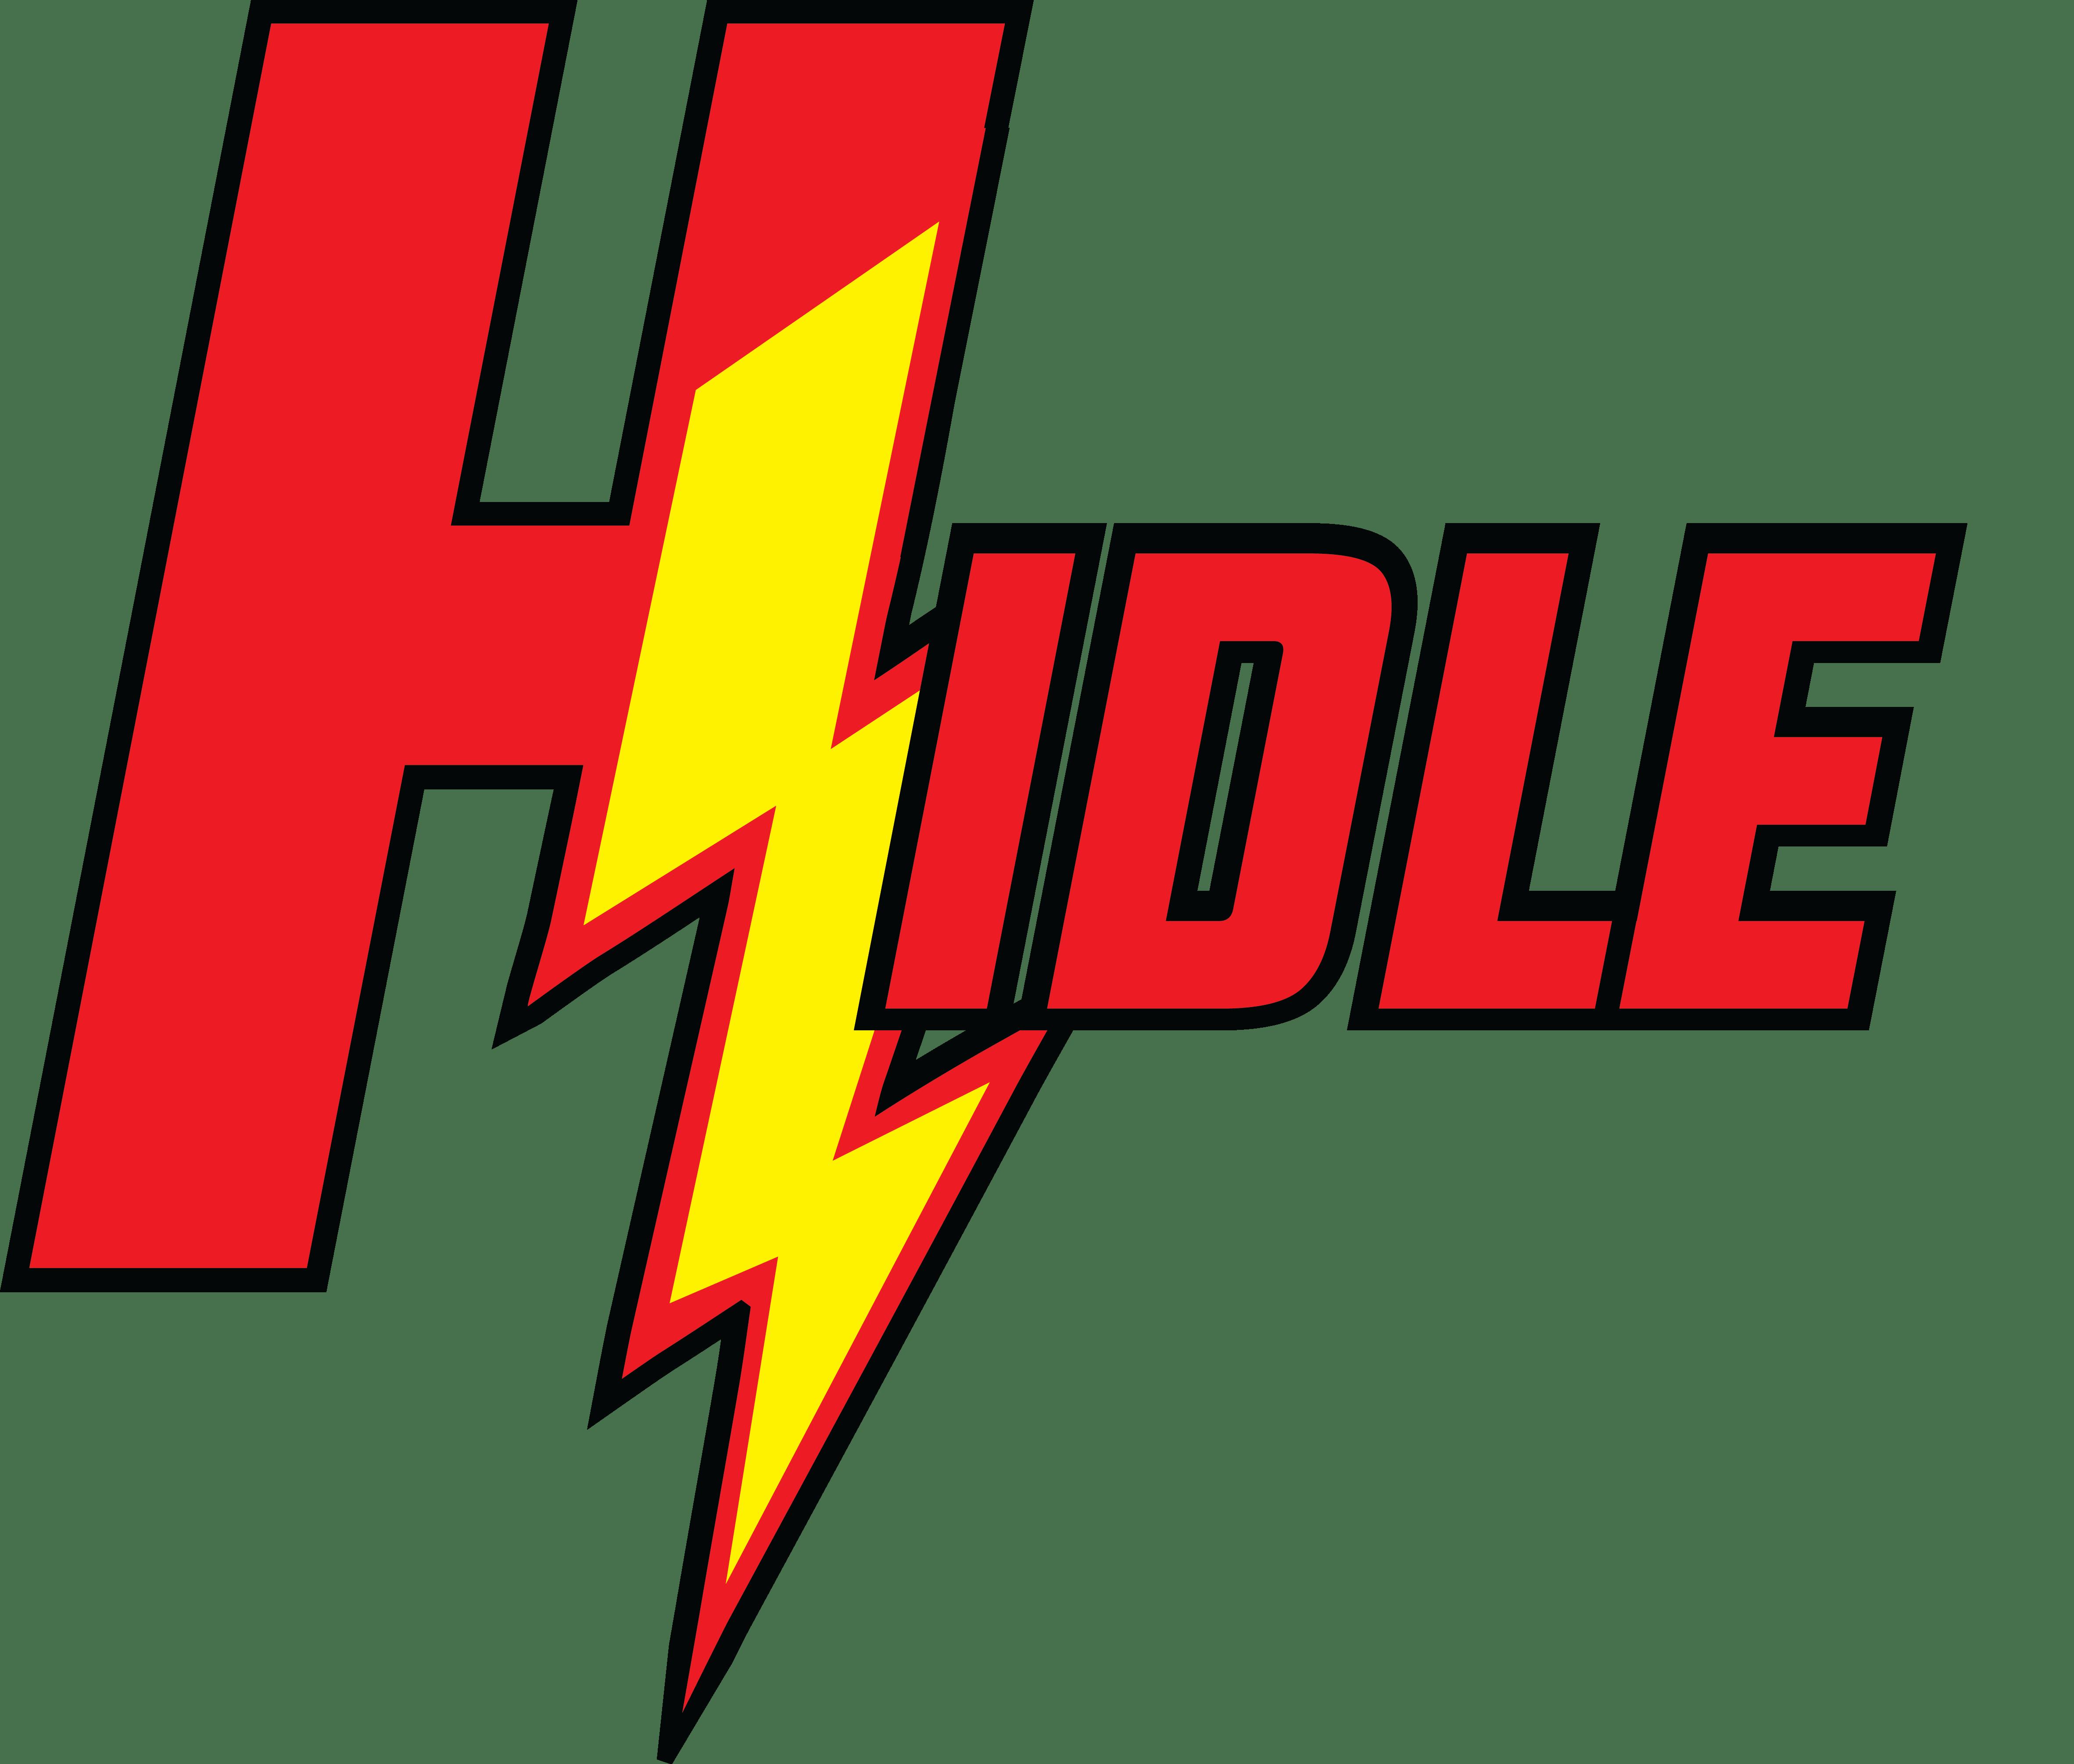 HIDLE Pty Ltd